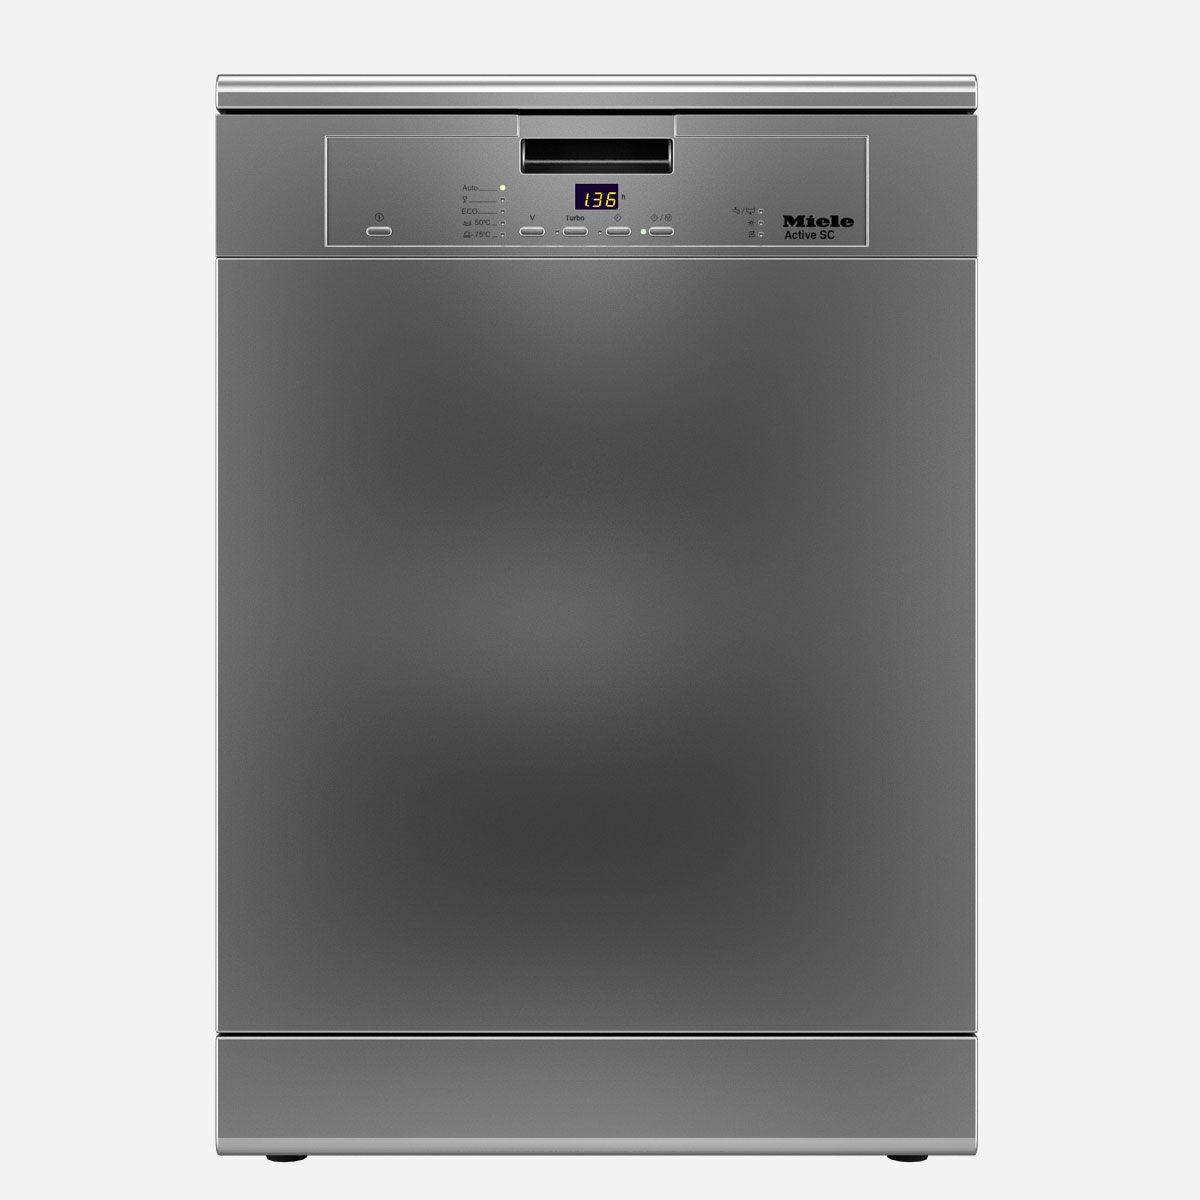 Miele G 4203 Sc Active Dishwasher Miele Dishwasher Active